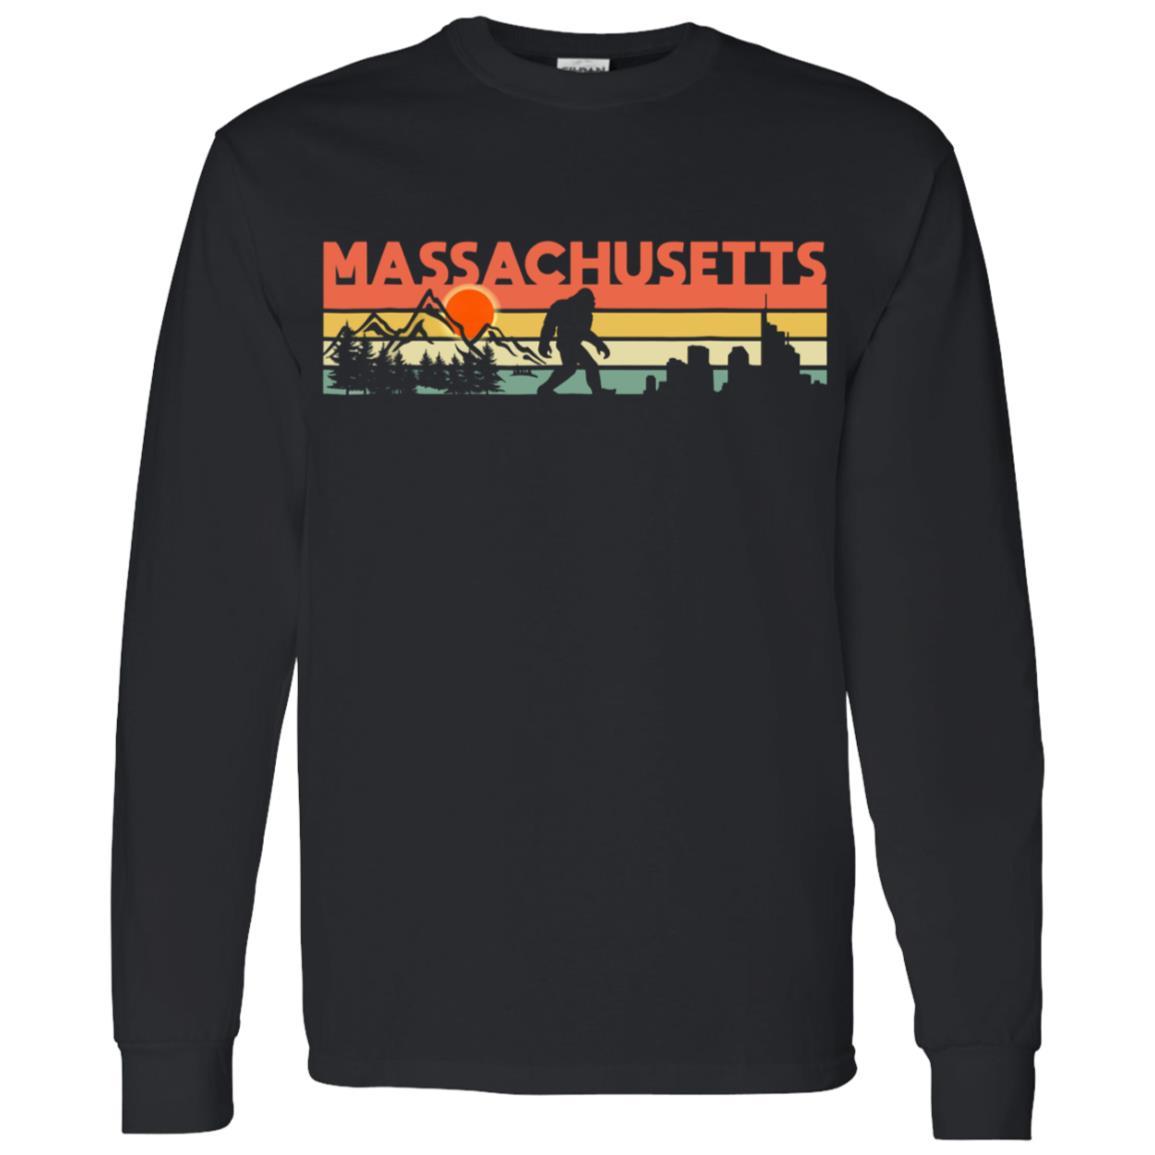 Vintage Massachusetts Bigfoot Silhouette Sun Men Long Sleeve T-Shirt